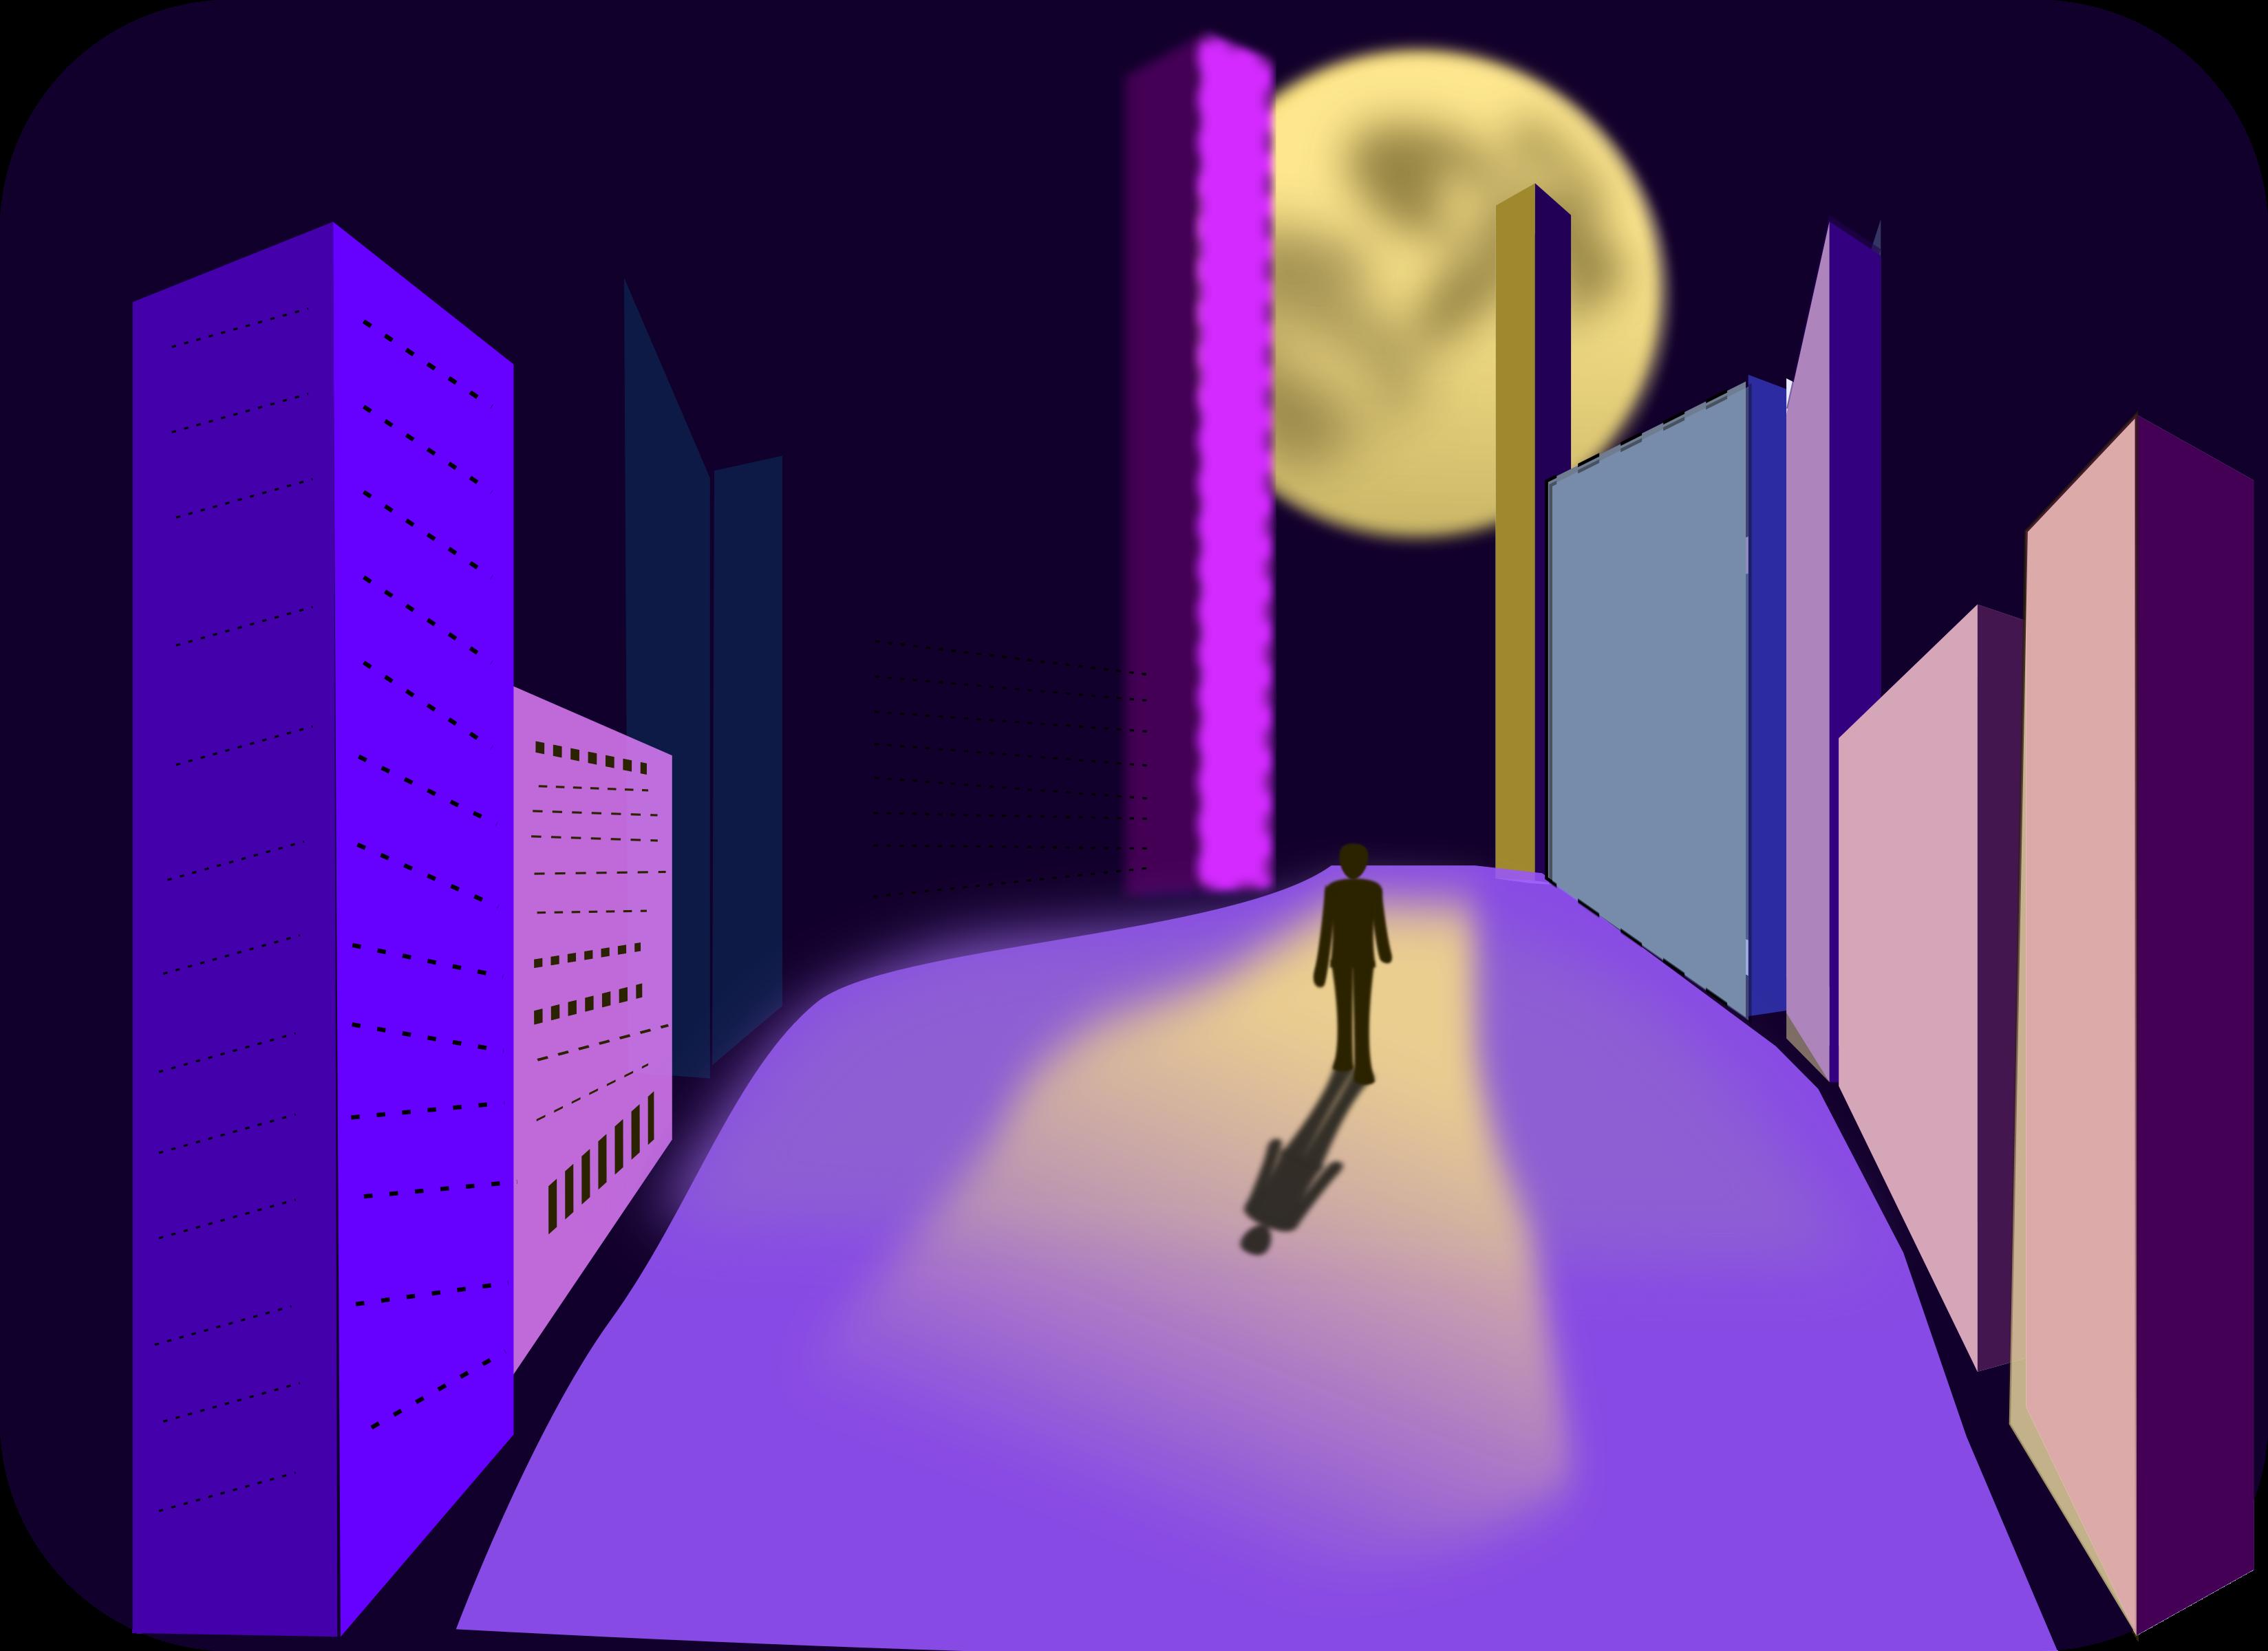 Night clipart city. Walk big image png